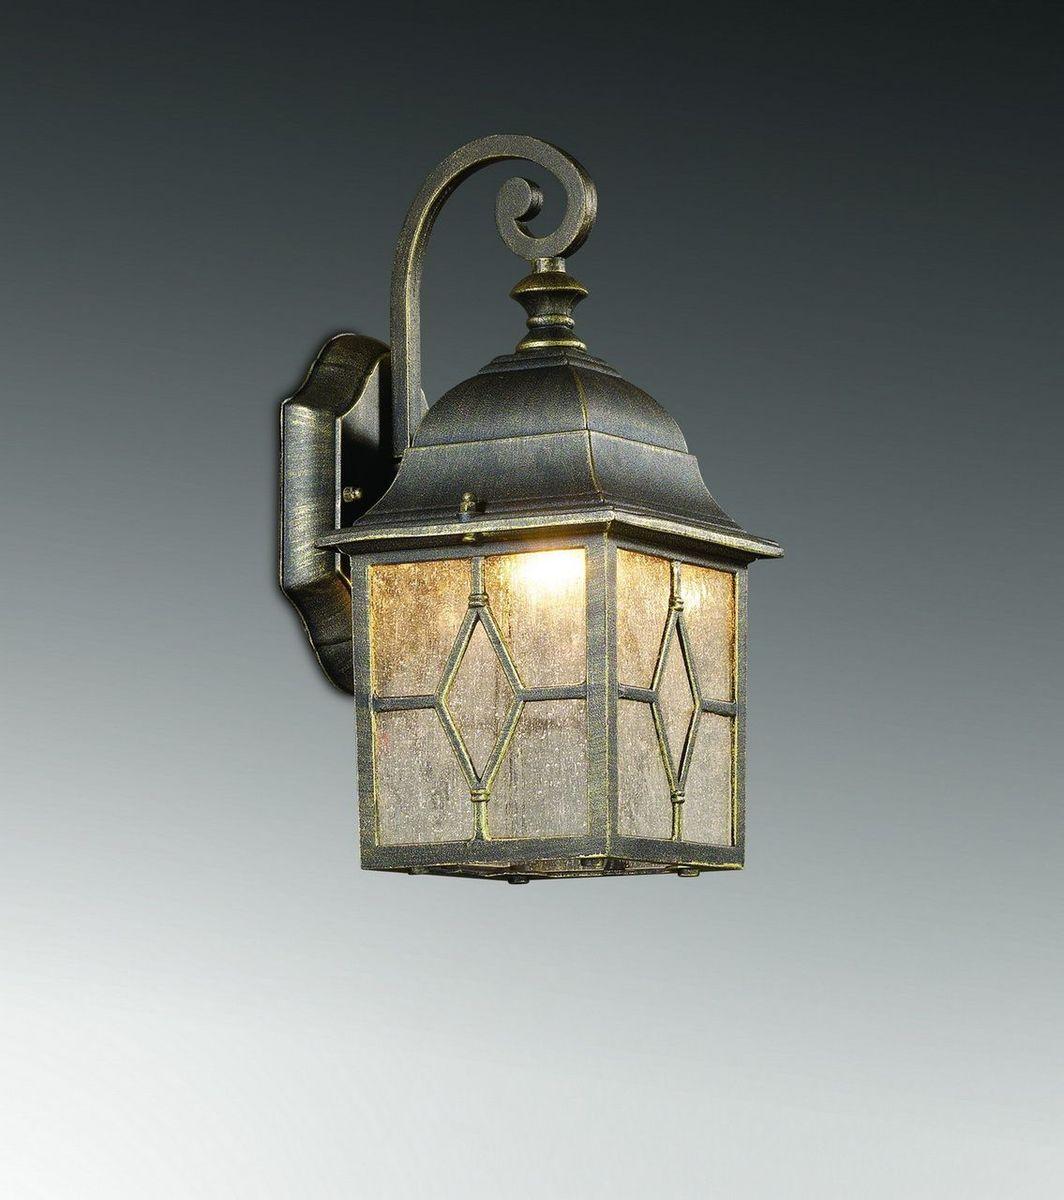 Светильник уличный настенный Odeon Light Lartua, 1 х E27, 60W. 2309/1W2309/1W